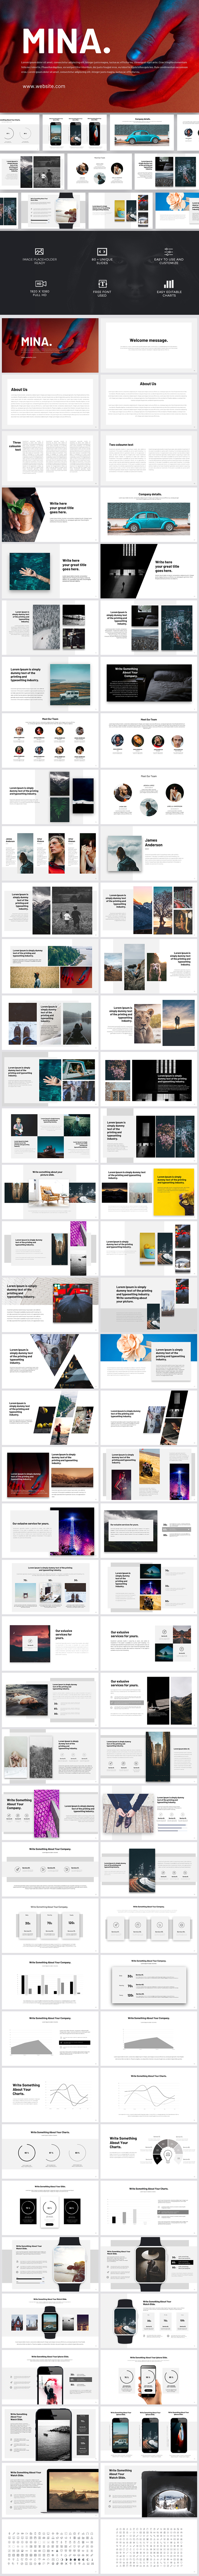 Mina Google Slides - Google Slides Presentation Templates